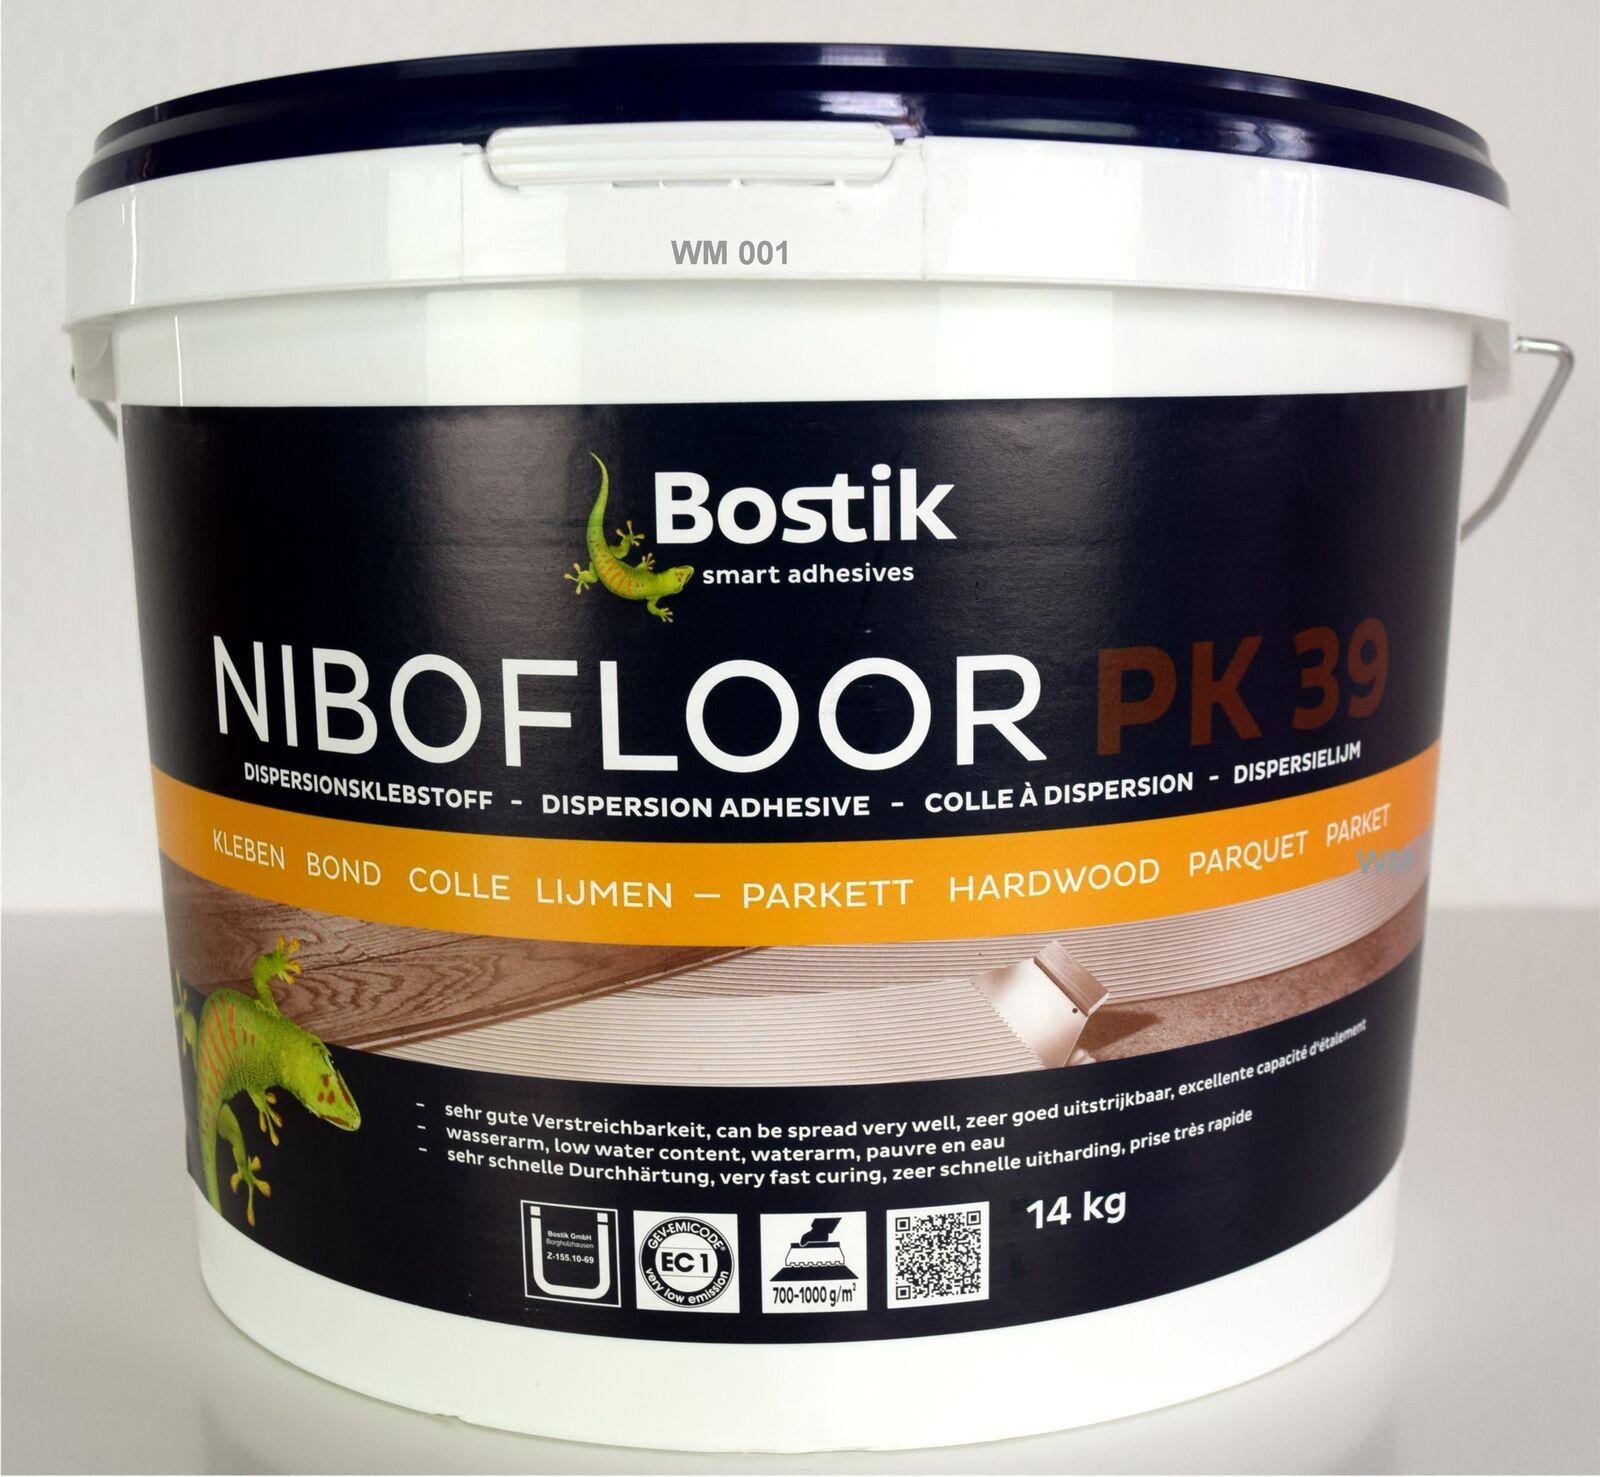 BOSTIK Nibofloor PK 39 Parkettkleber 14kg Parkettklebstoff Dispersionkleber für